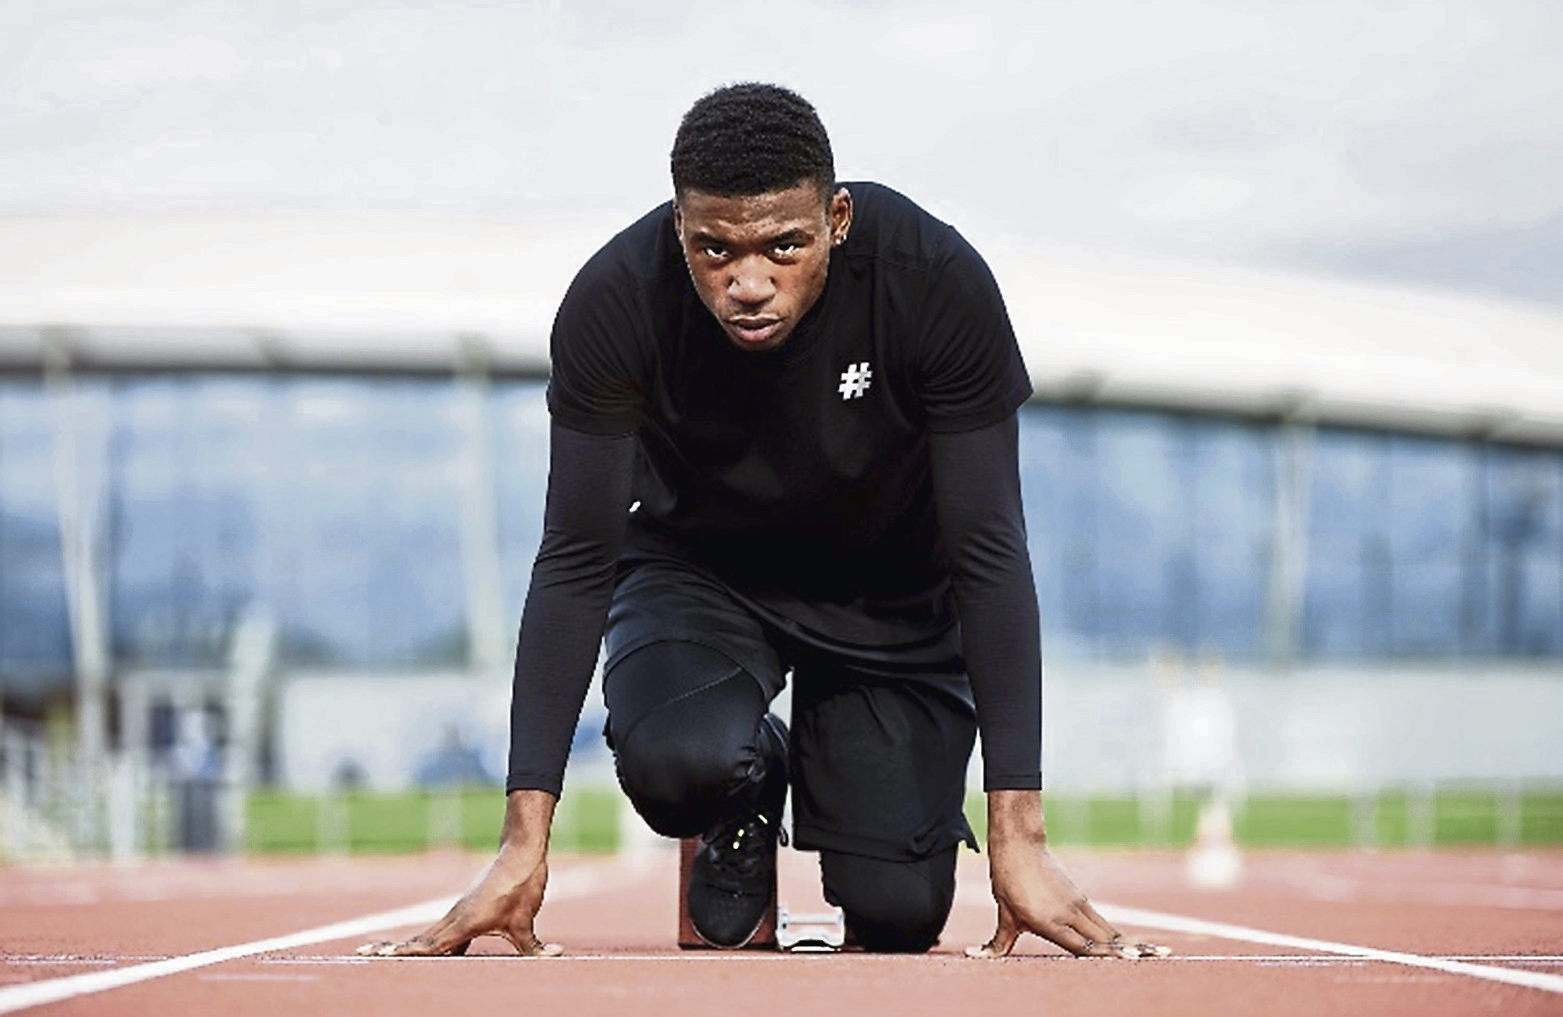 KU 400 metre runner dreaming of Tokyo Olympics after national team debut win